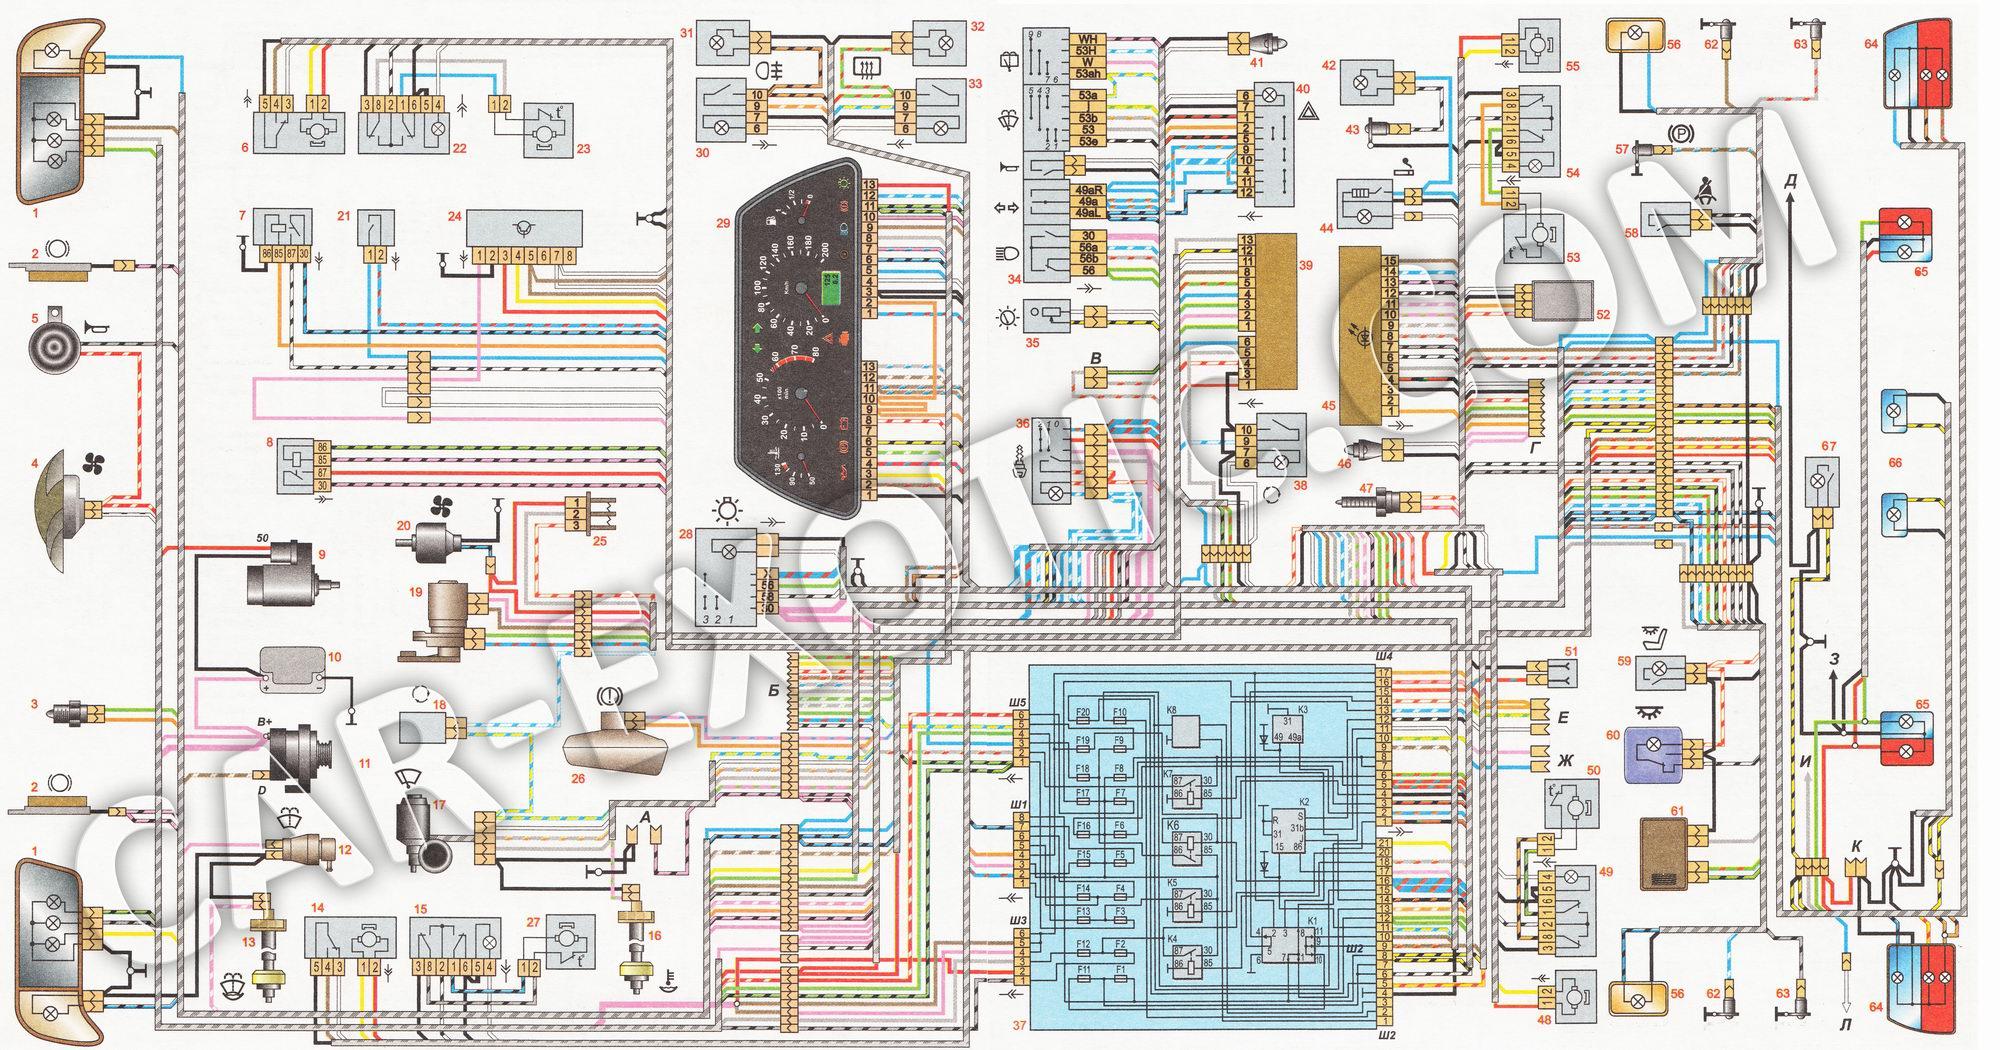 Фото №14 - ВАЗ 2110 инжектор схема